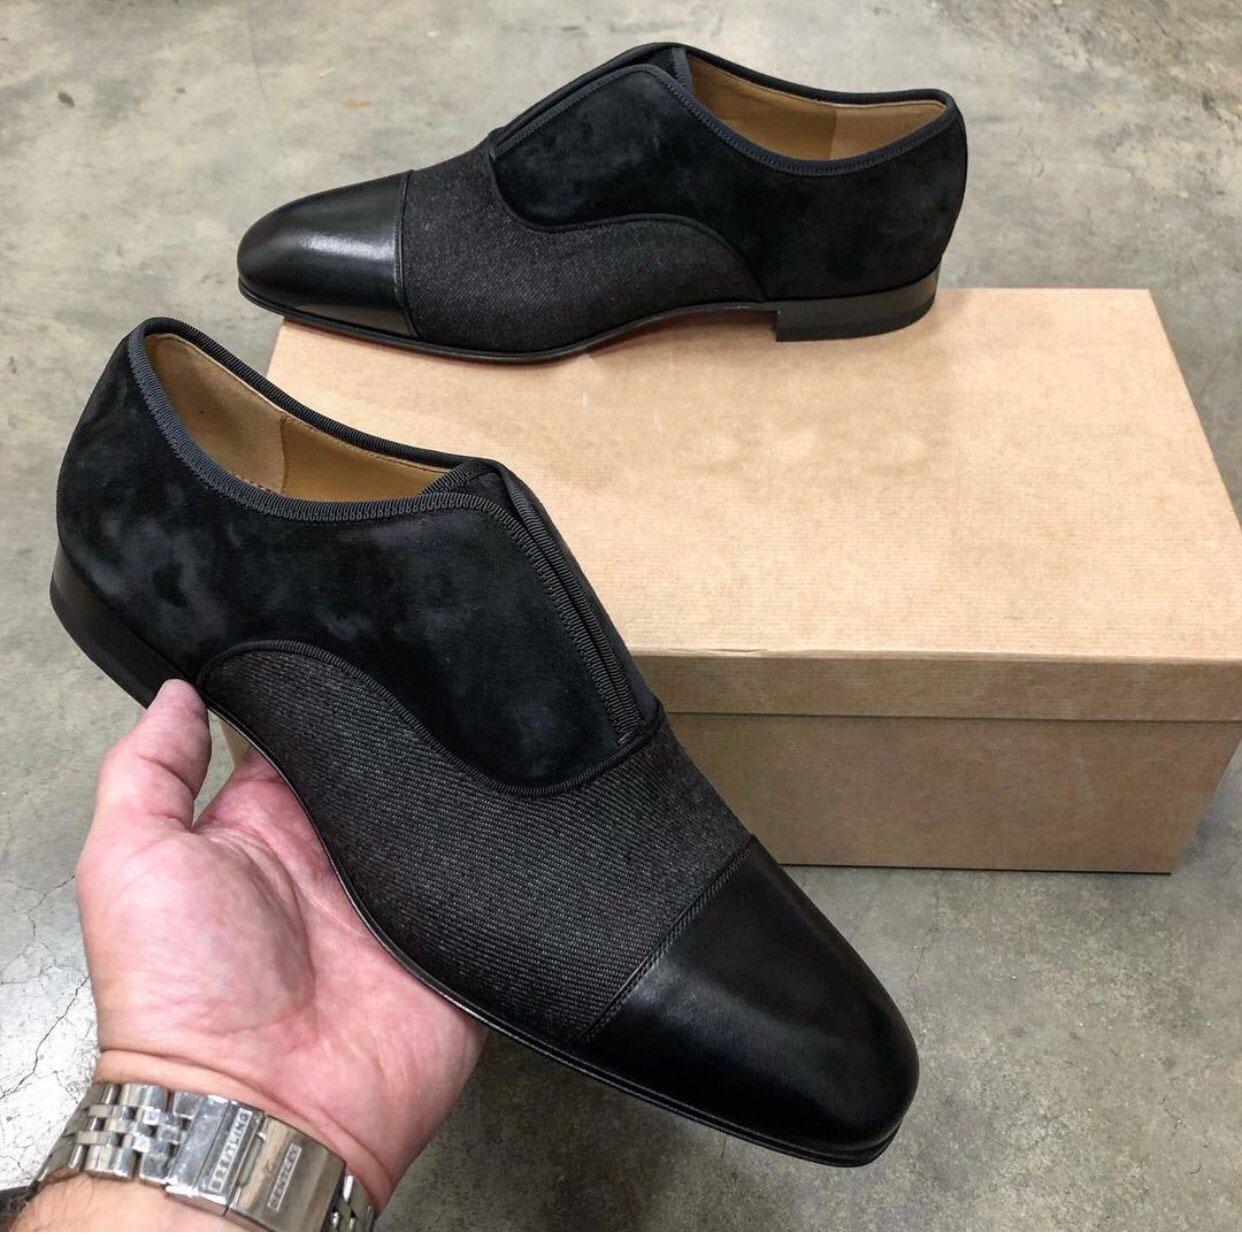 ZapatosLouboutinClcristianoElegante Alfa Vestido Masculino Mocasines Zapatos Lujosos Para Hombres De Zapatillas De Zapatillas De Zapatillas De Zapatillas De Zapatillas De Arte